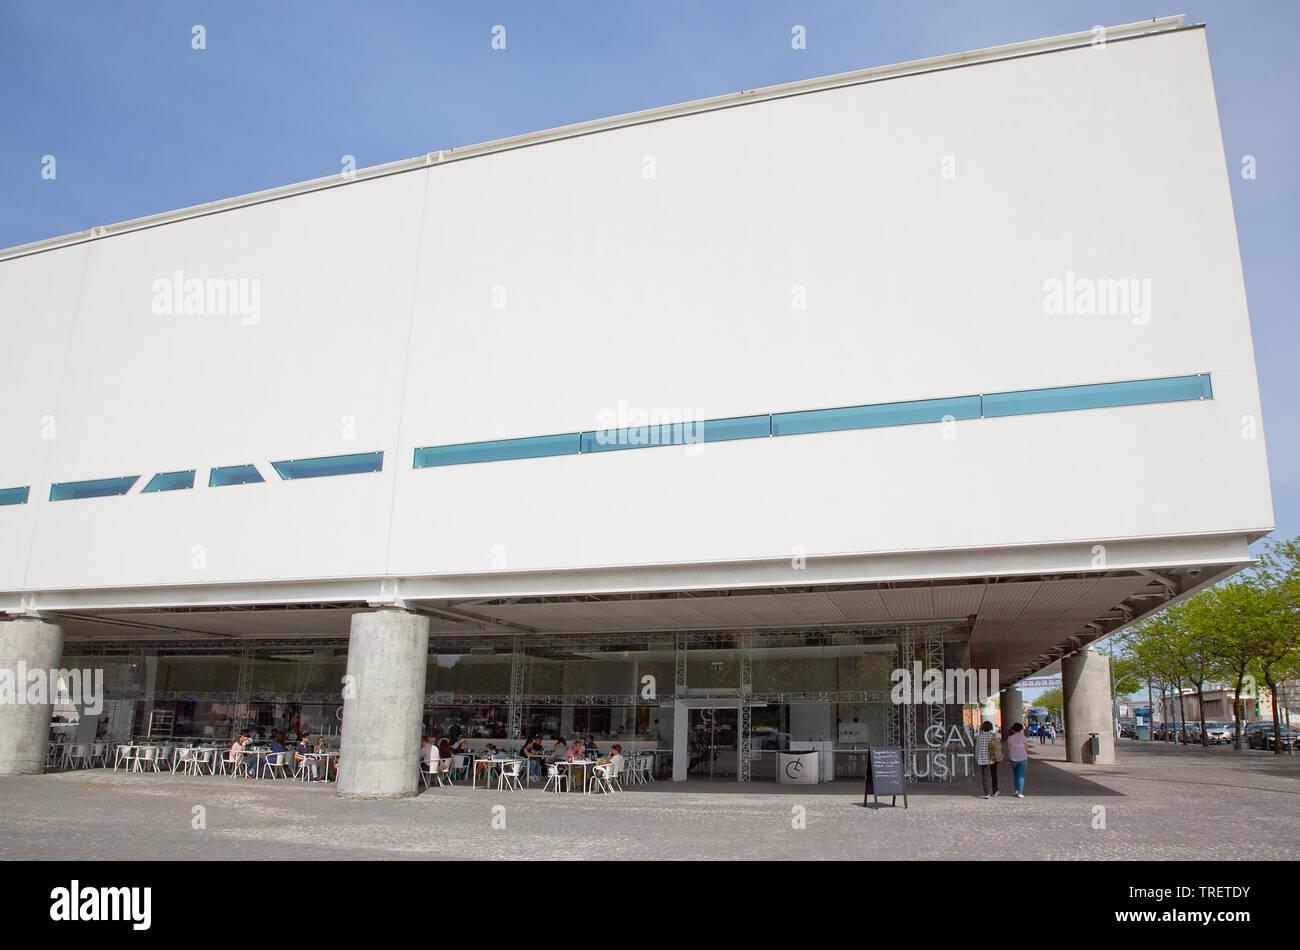 Portugal, Estredmadura, Lisbon, Belem, Cavalo Lusitano cafe in modern building. - Stock Image